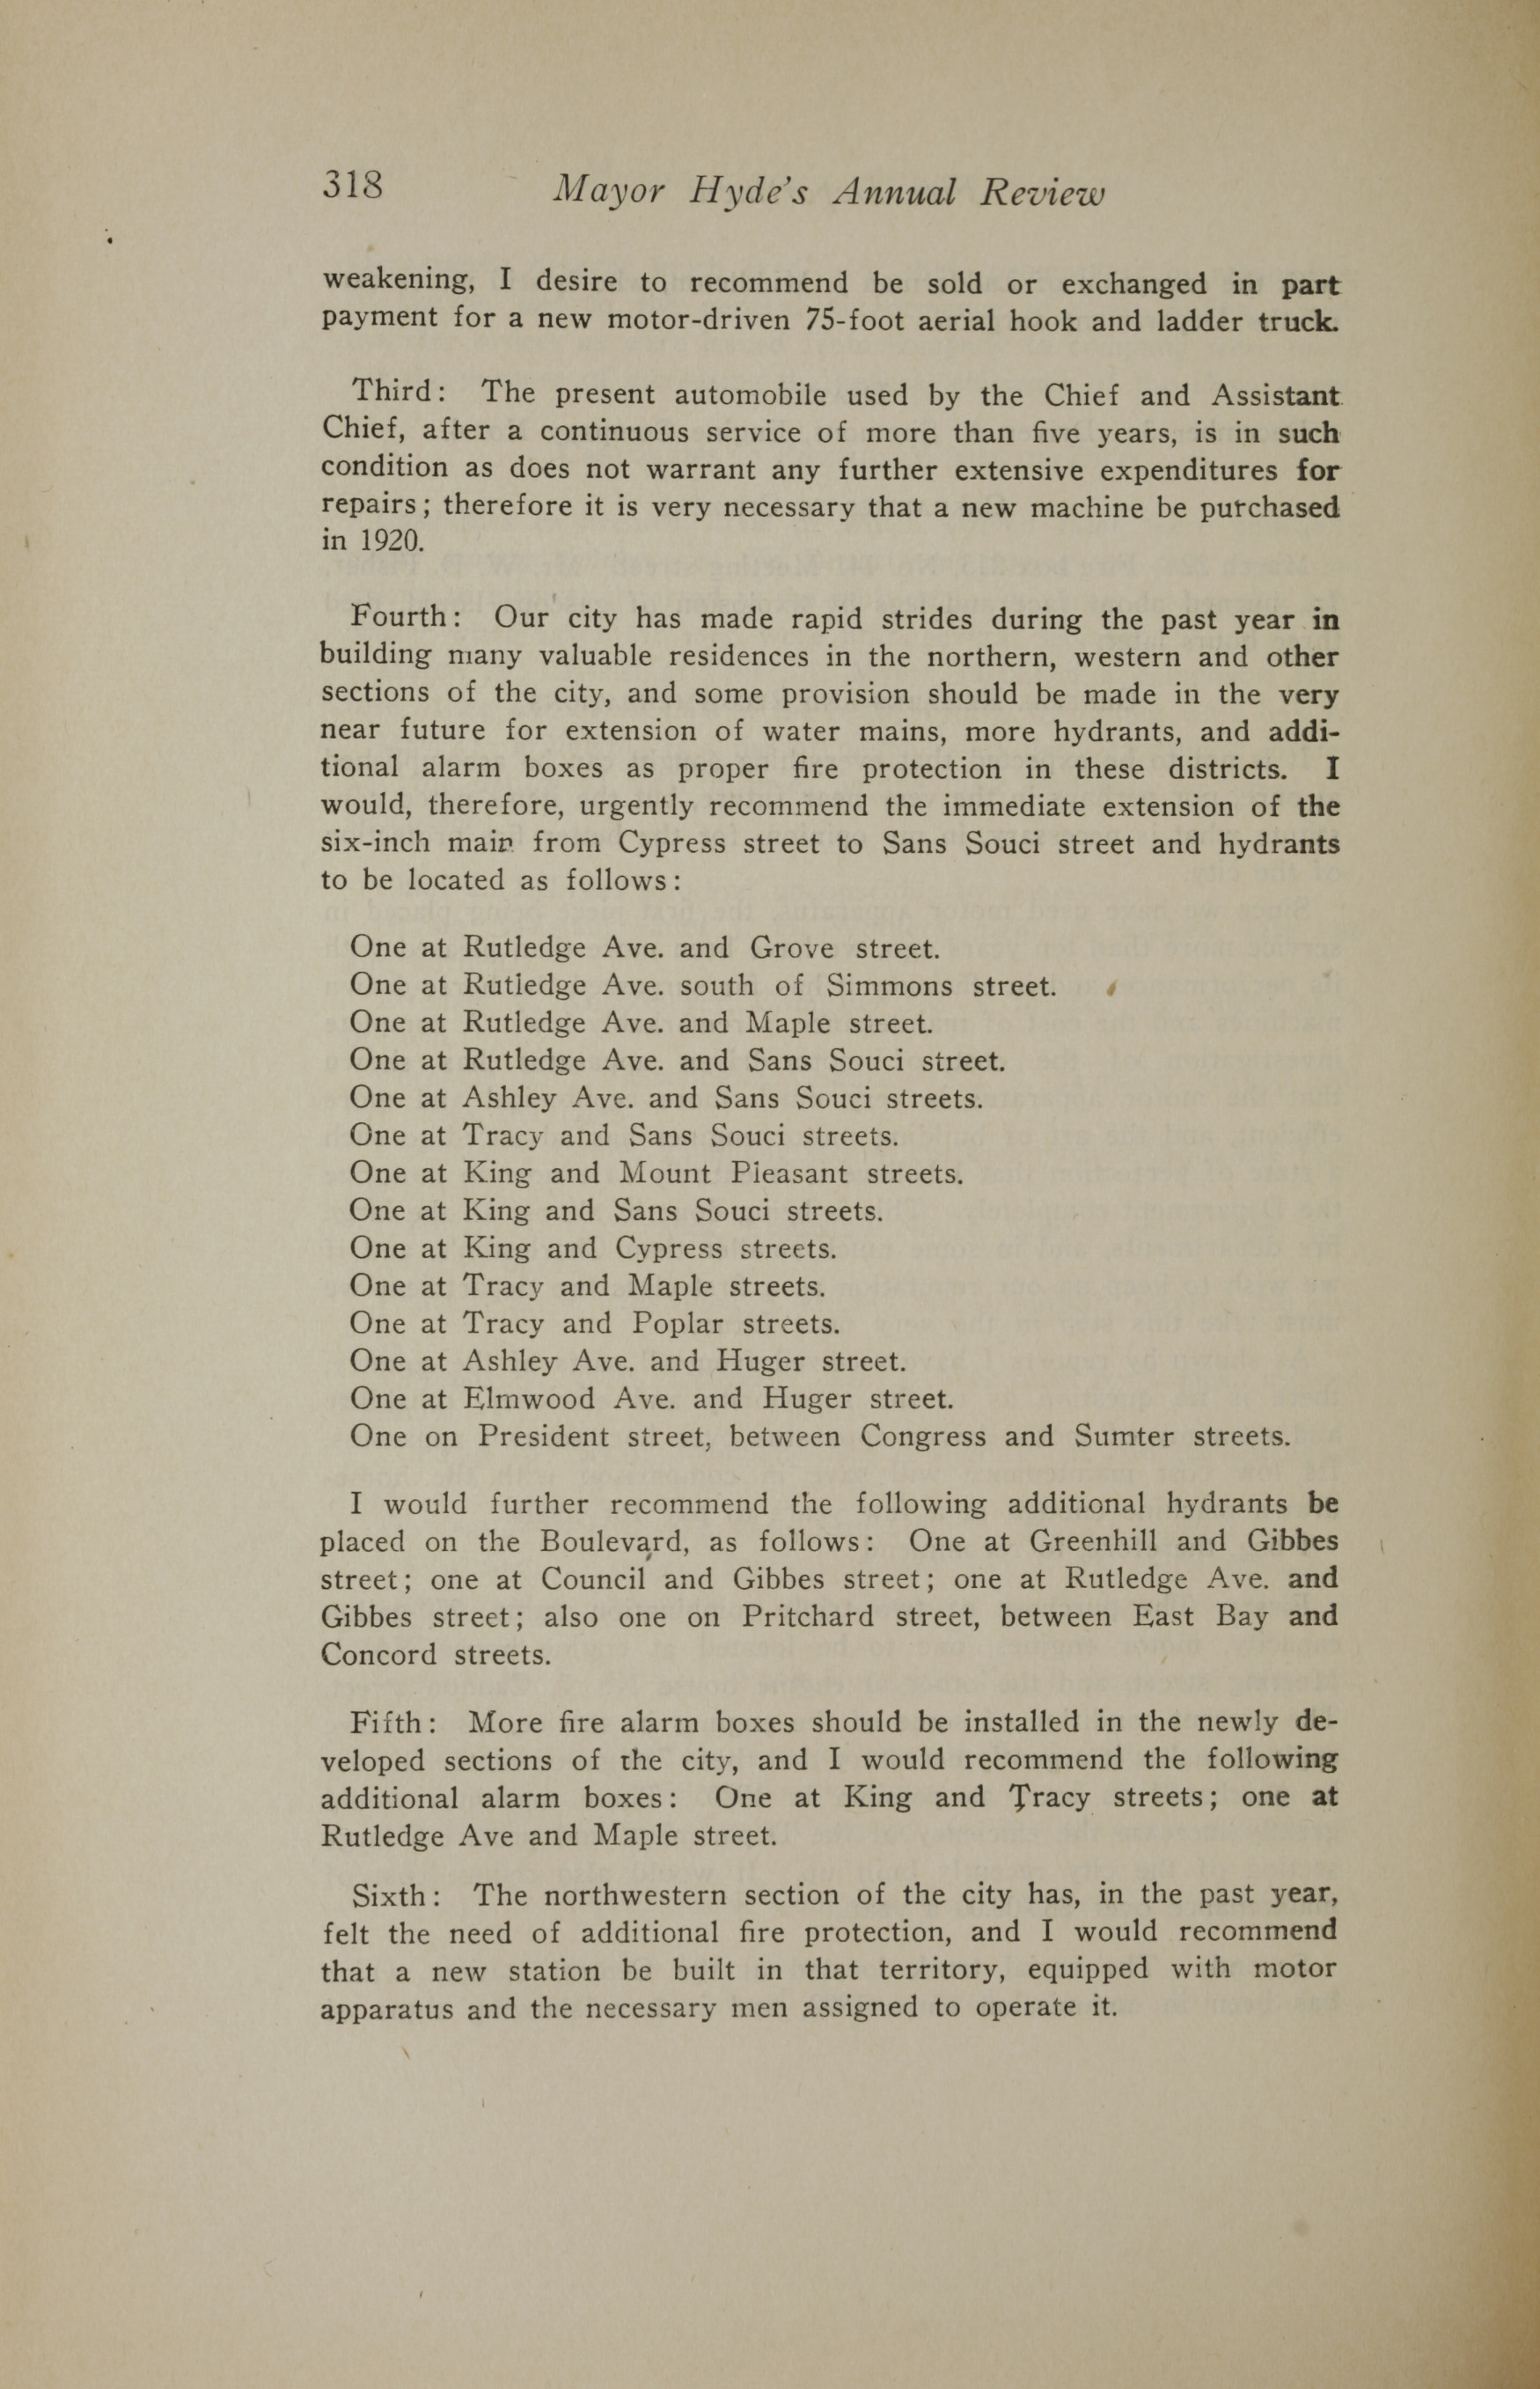 Charleston Yearbook, 1919, page 318